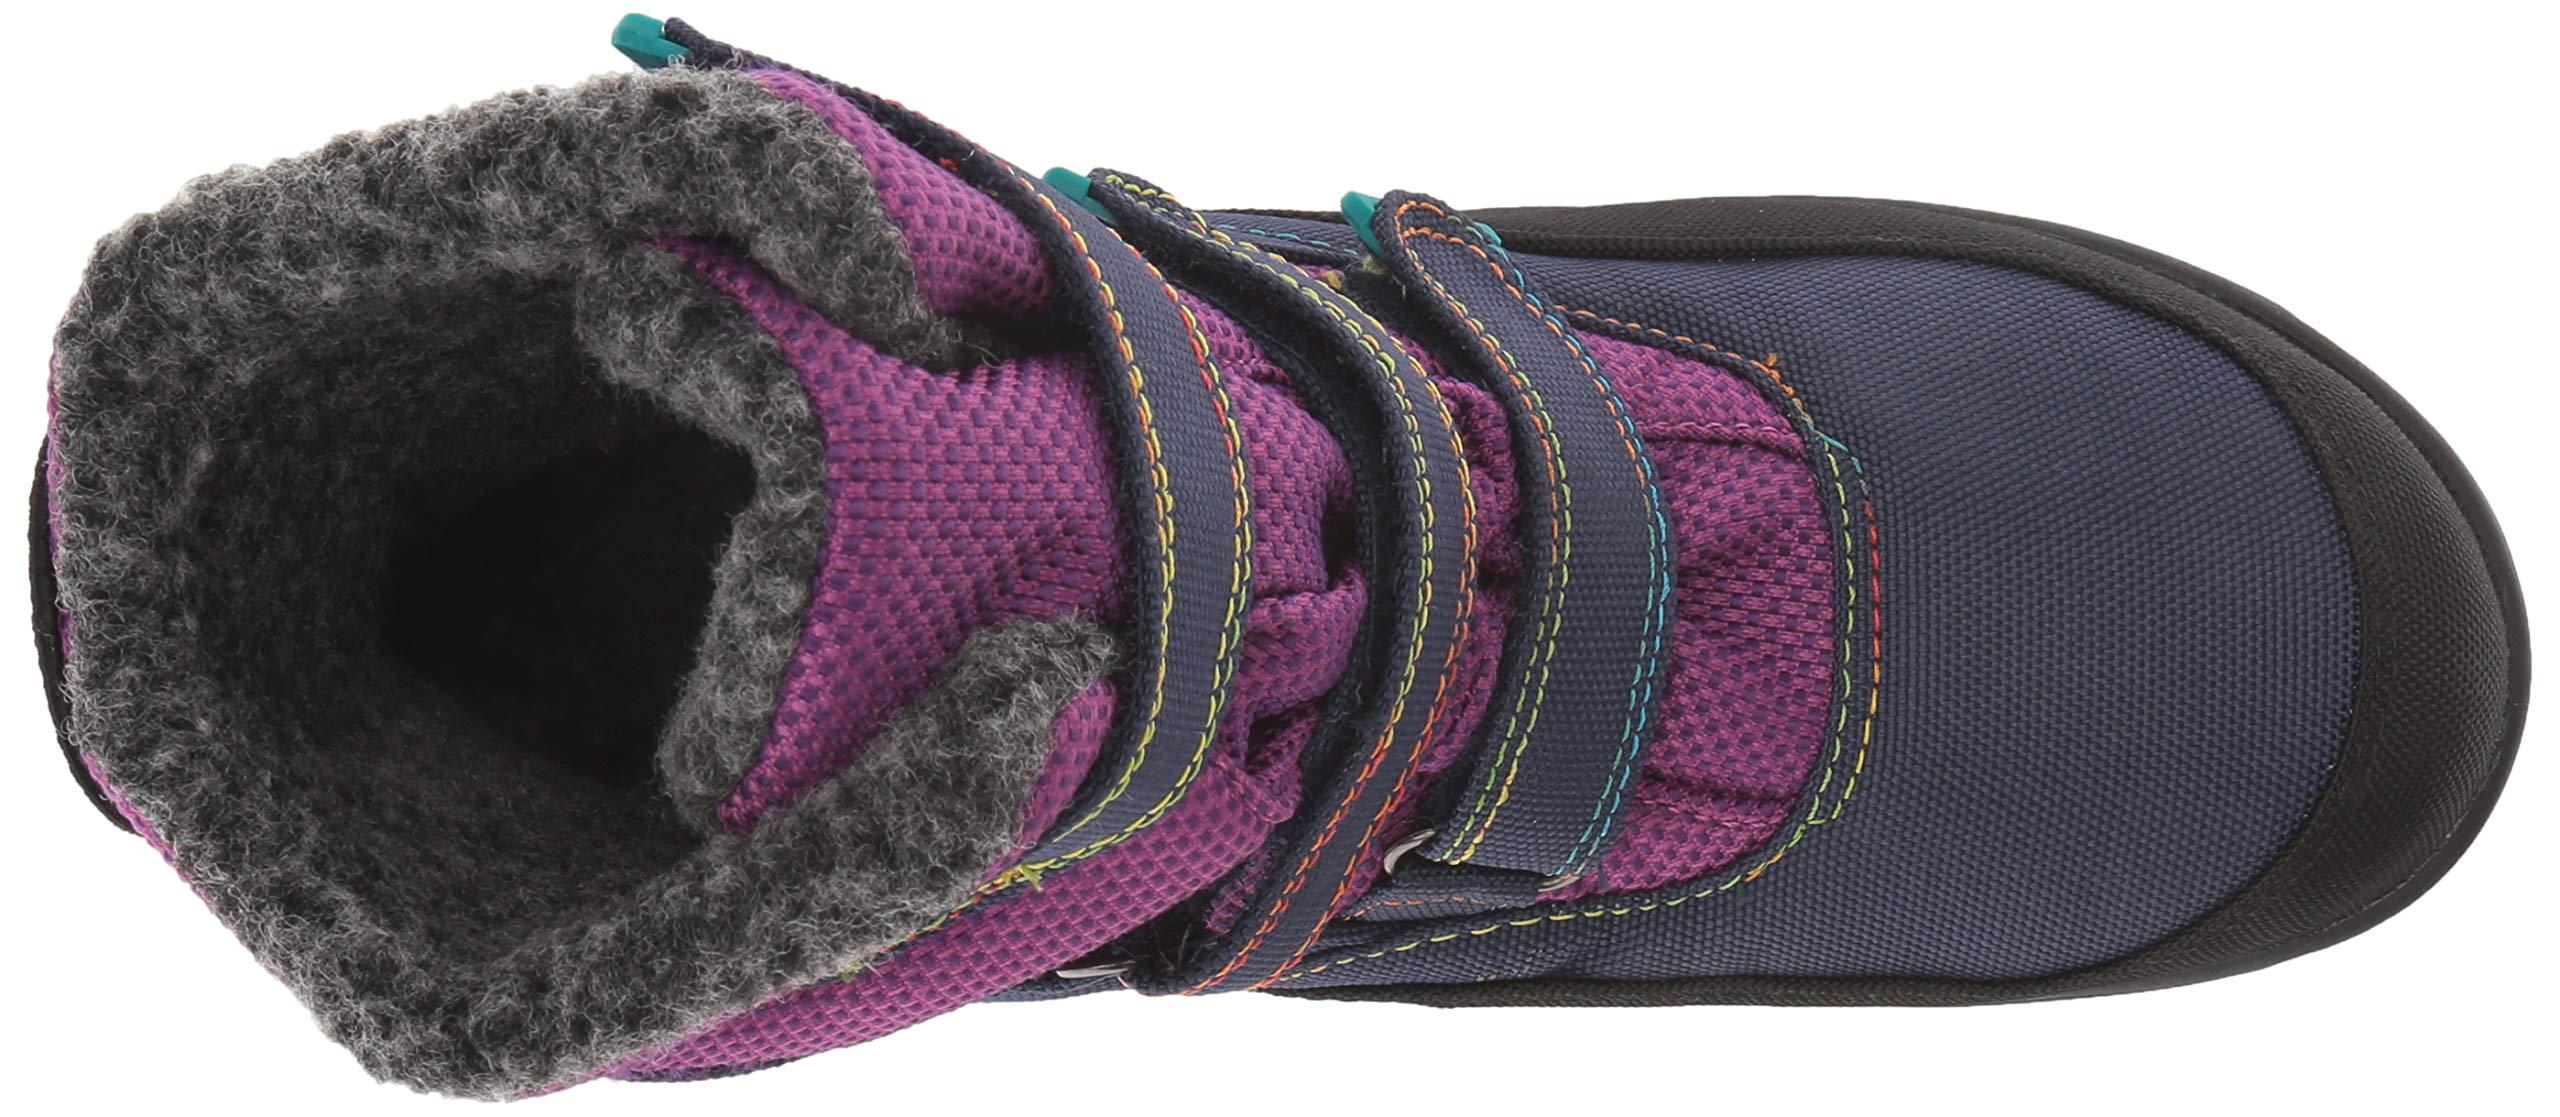 Kamik Girls' Hayden Snow Boot, Grape, 4 Medium US Big Kid by Kamik (Image #7)